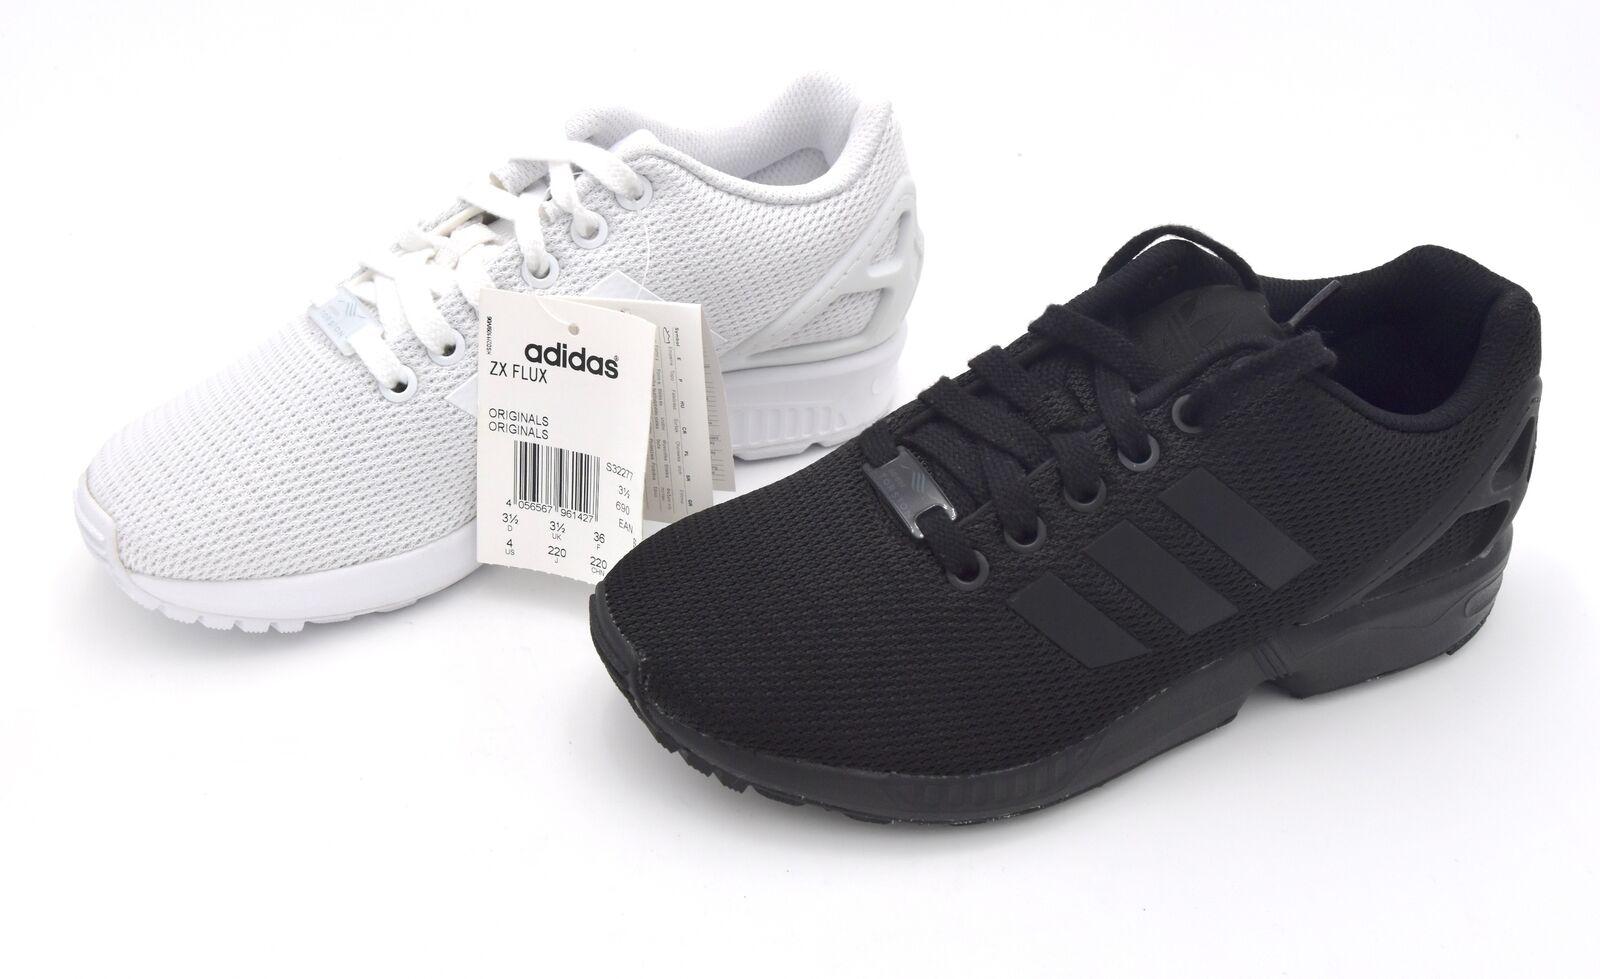 Adidas - sneaker sportiva erreicht tempo libero kunst.s32277 - s32279 zx flux